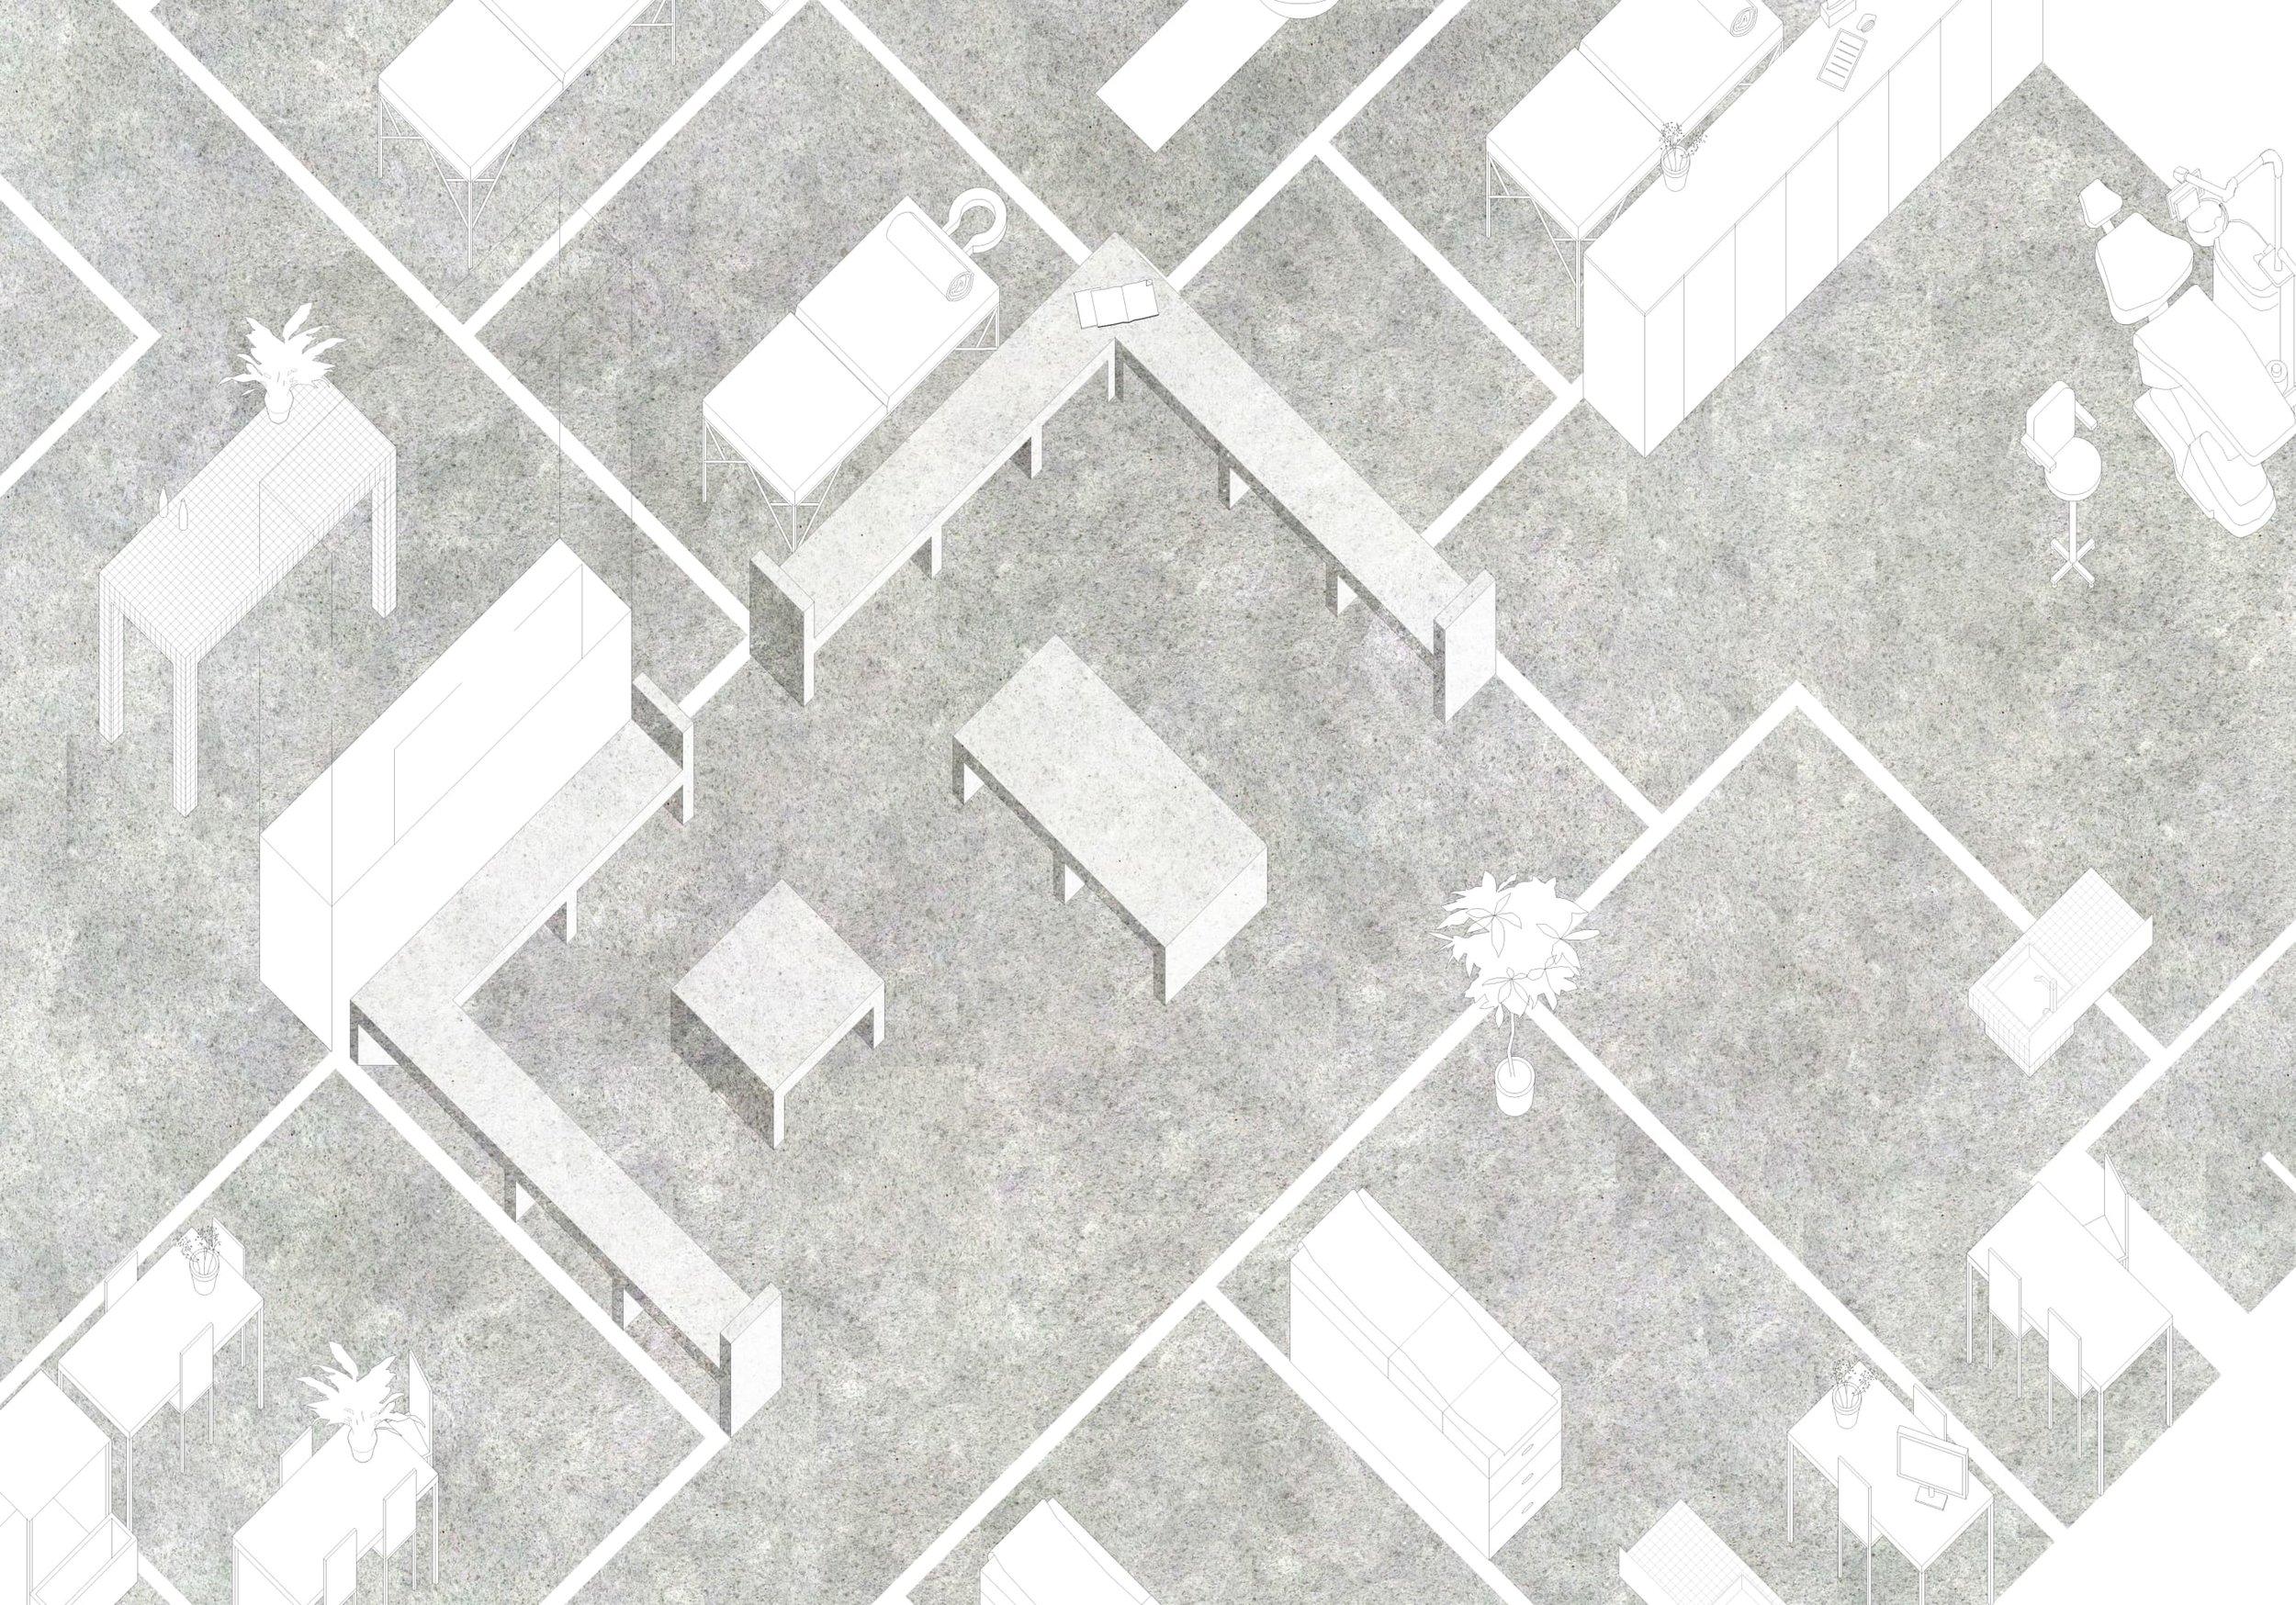 archaic_cilArchitecture_MaisonDeSanteSimoneVeil_14.jpg